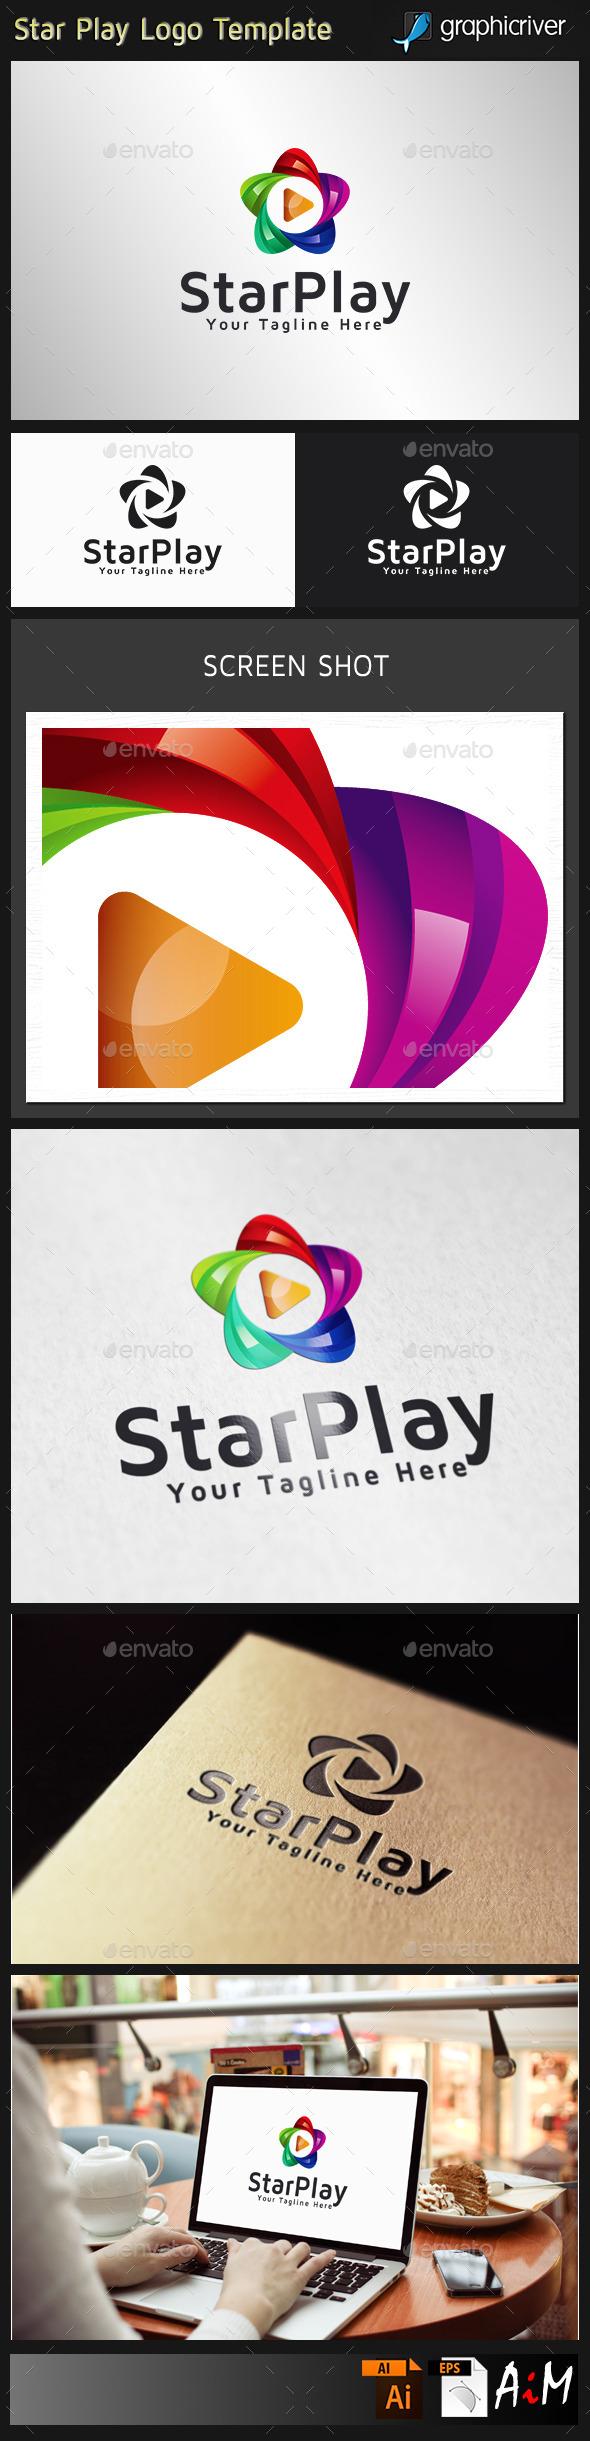 Star Play logo